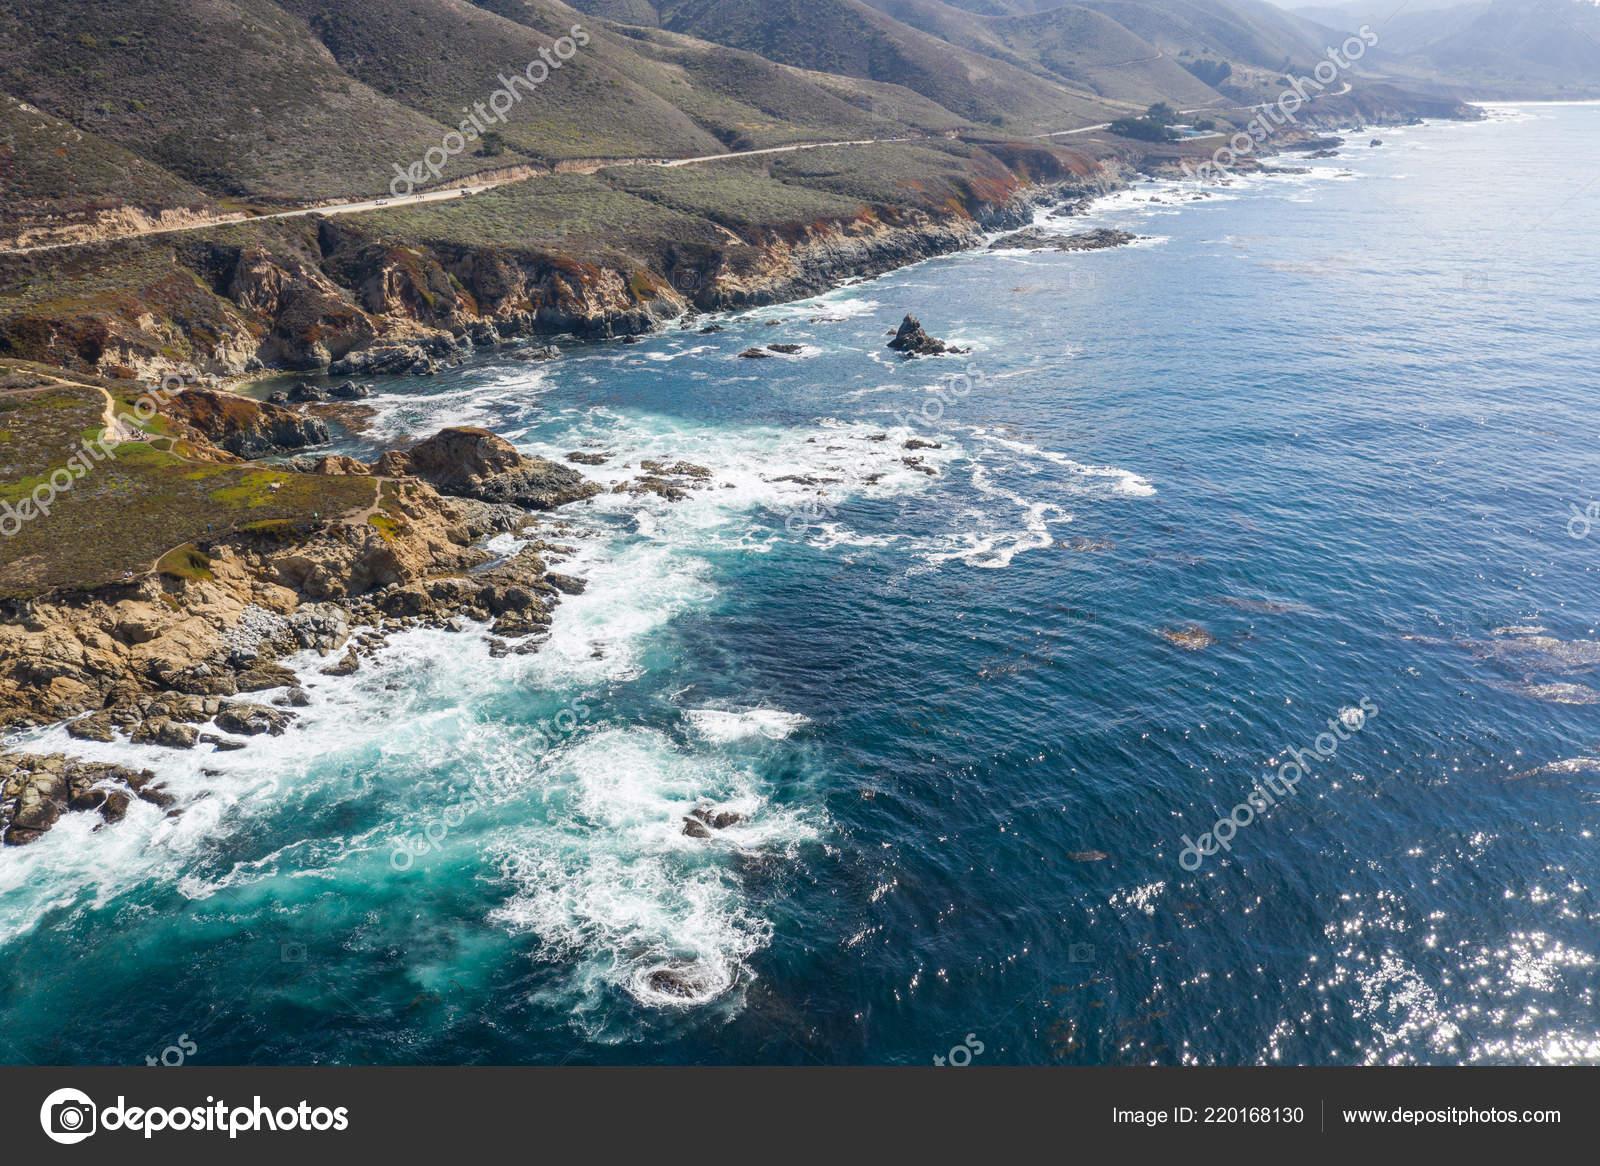 Cold Waters North Pacific Ocean Wash Rocky Scenic Coastline Northern